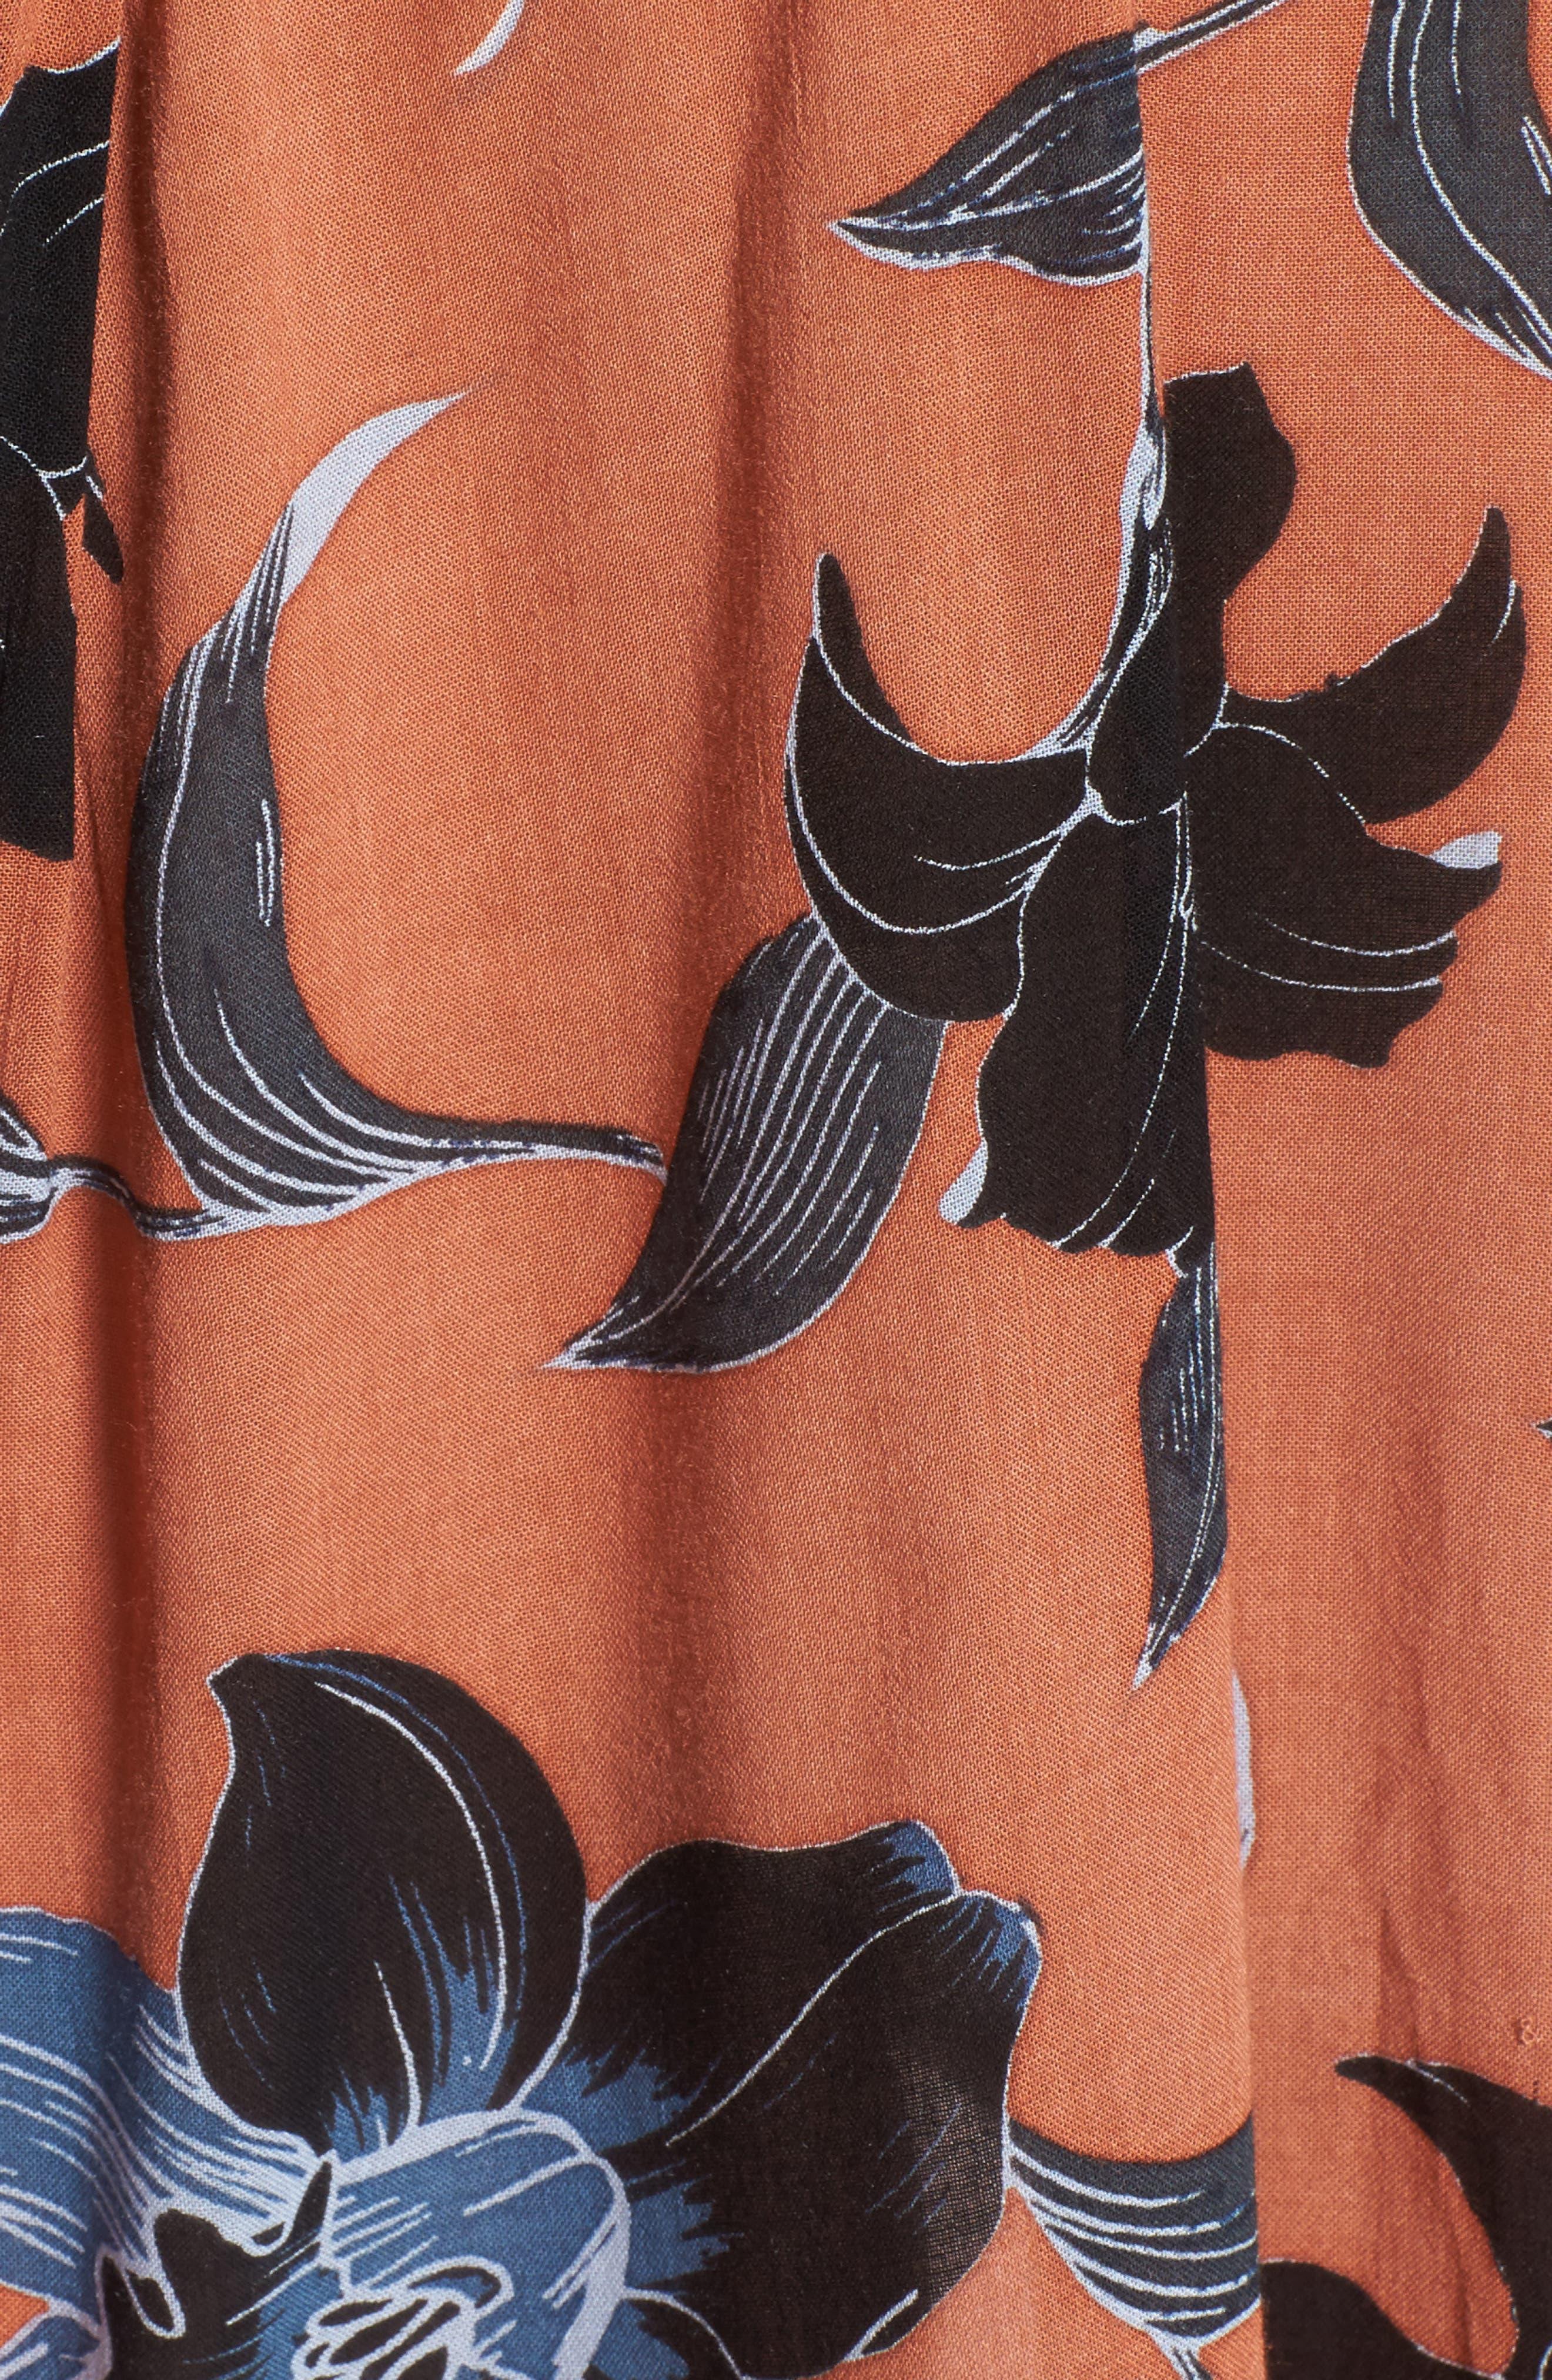 Nova Floral Print Dress,                             Alternate thumbnail 5, color,                             Maldives Print